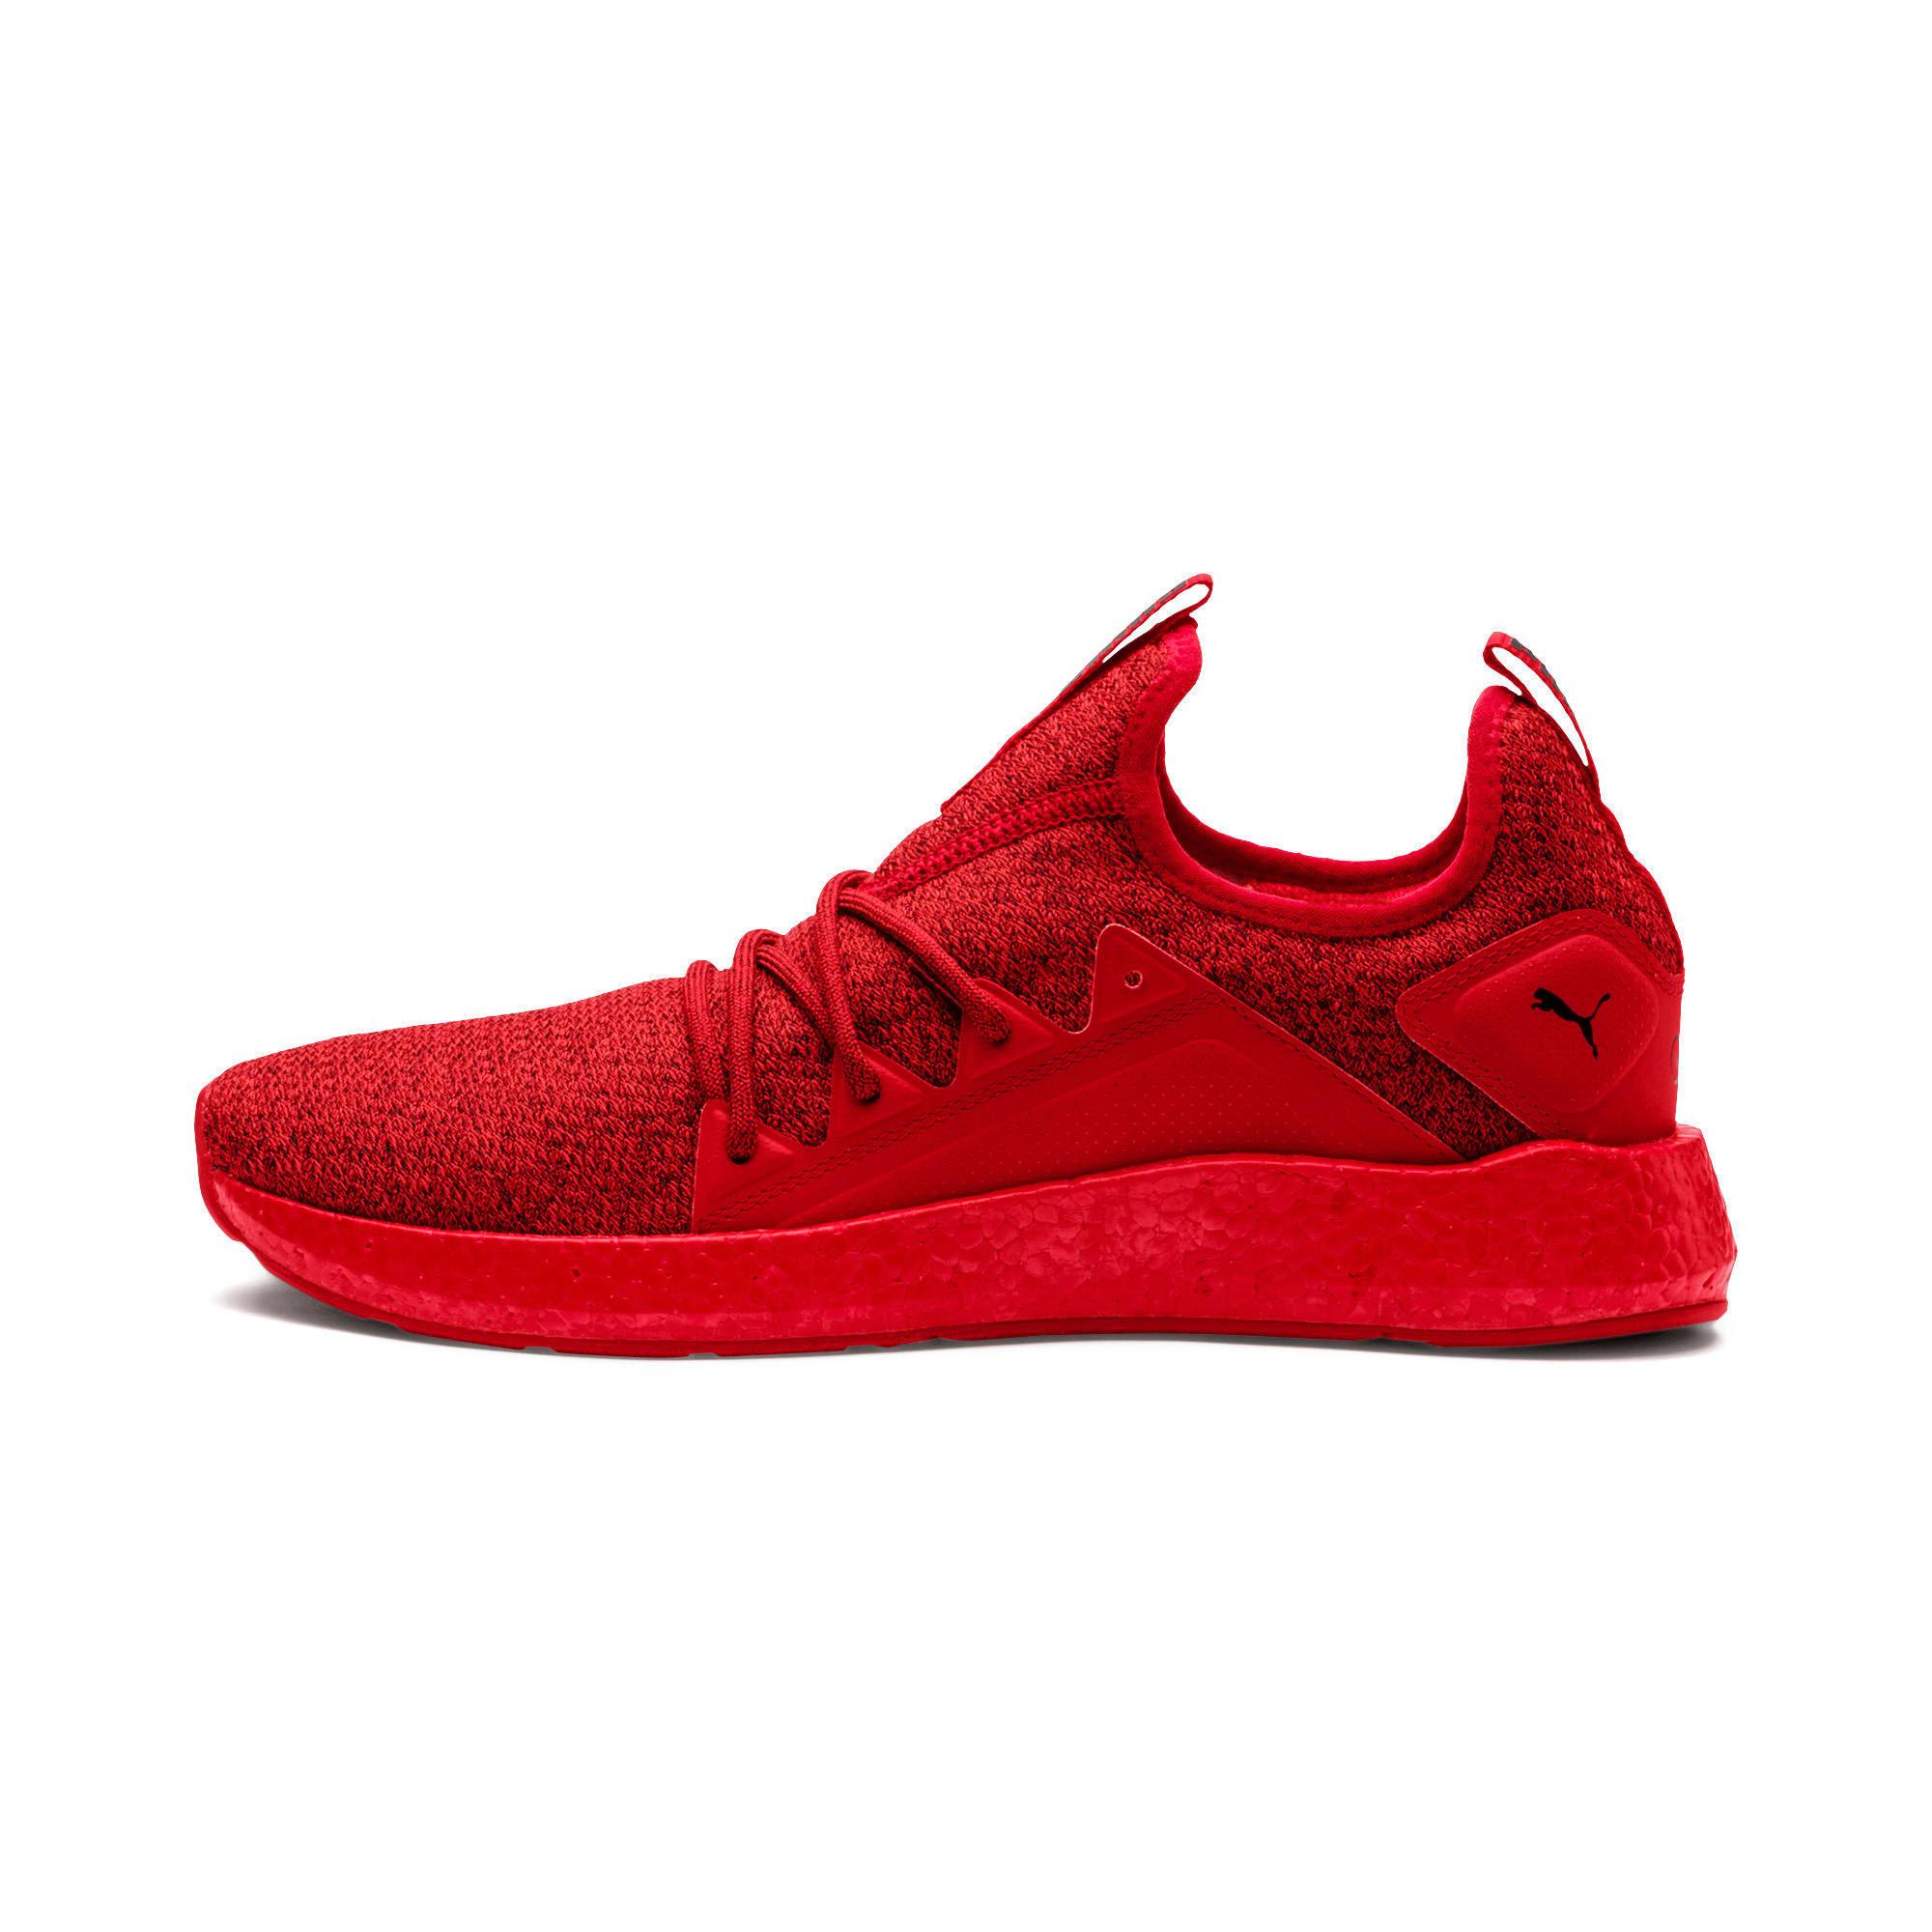 Thumbnail 1 of NRGY Neko Knit Men's Running Shoes, High Risk Red-Puma Black, medium